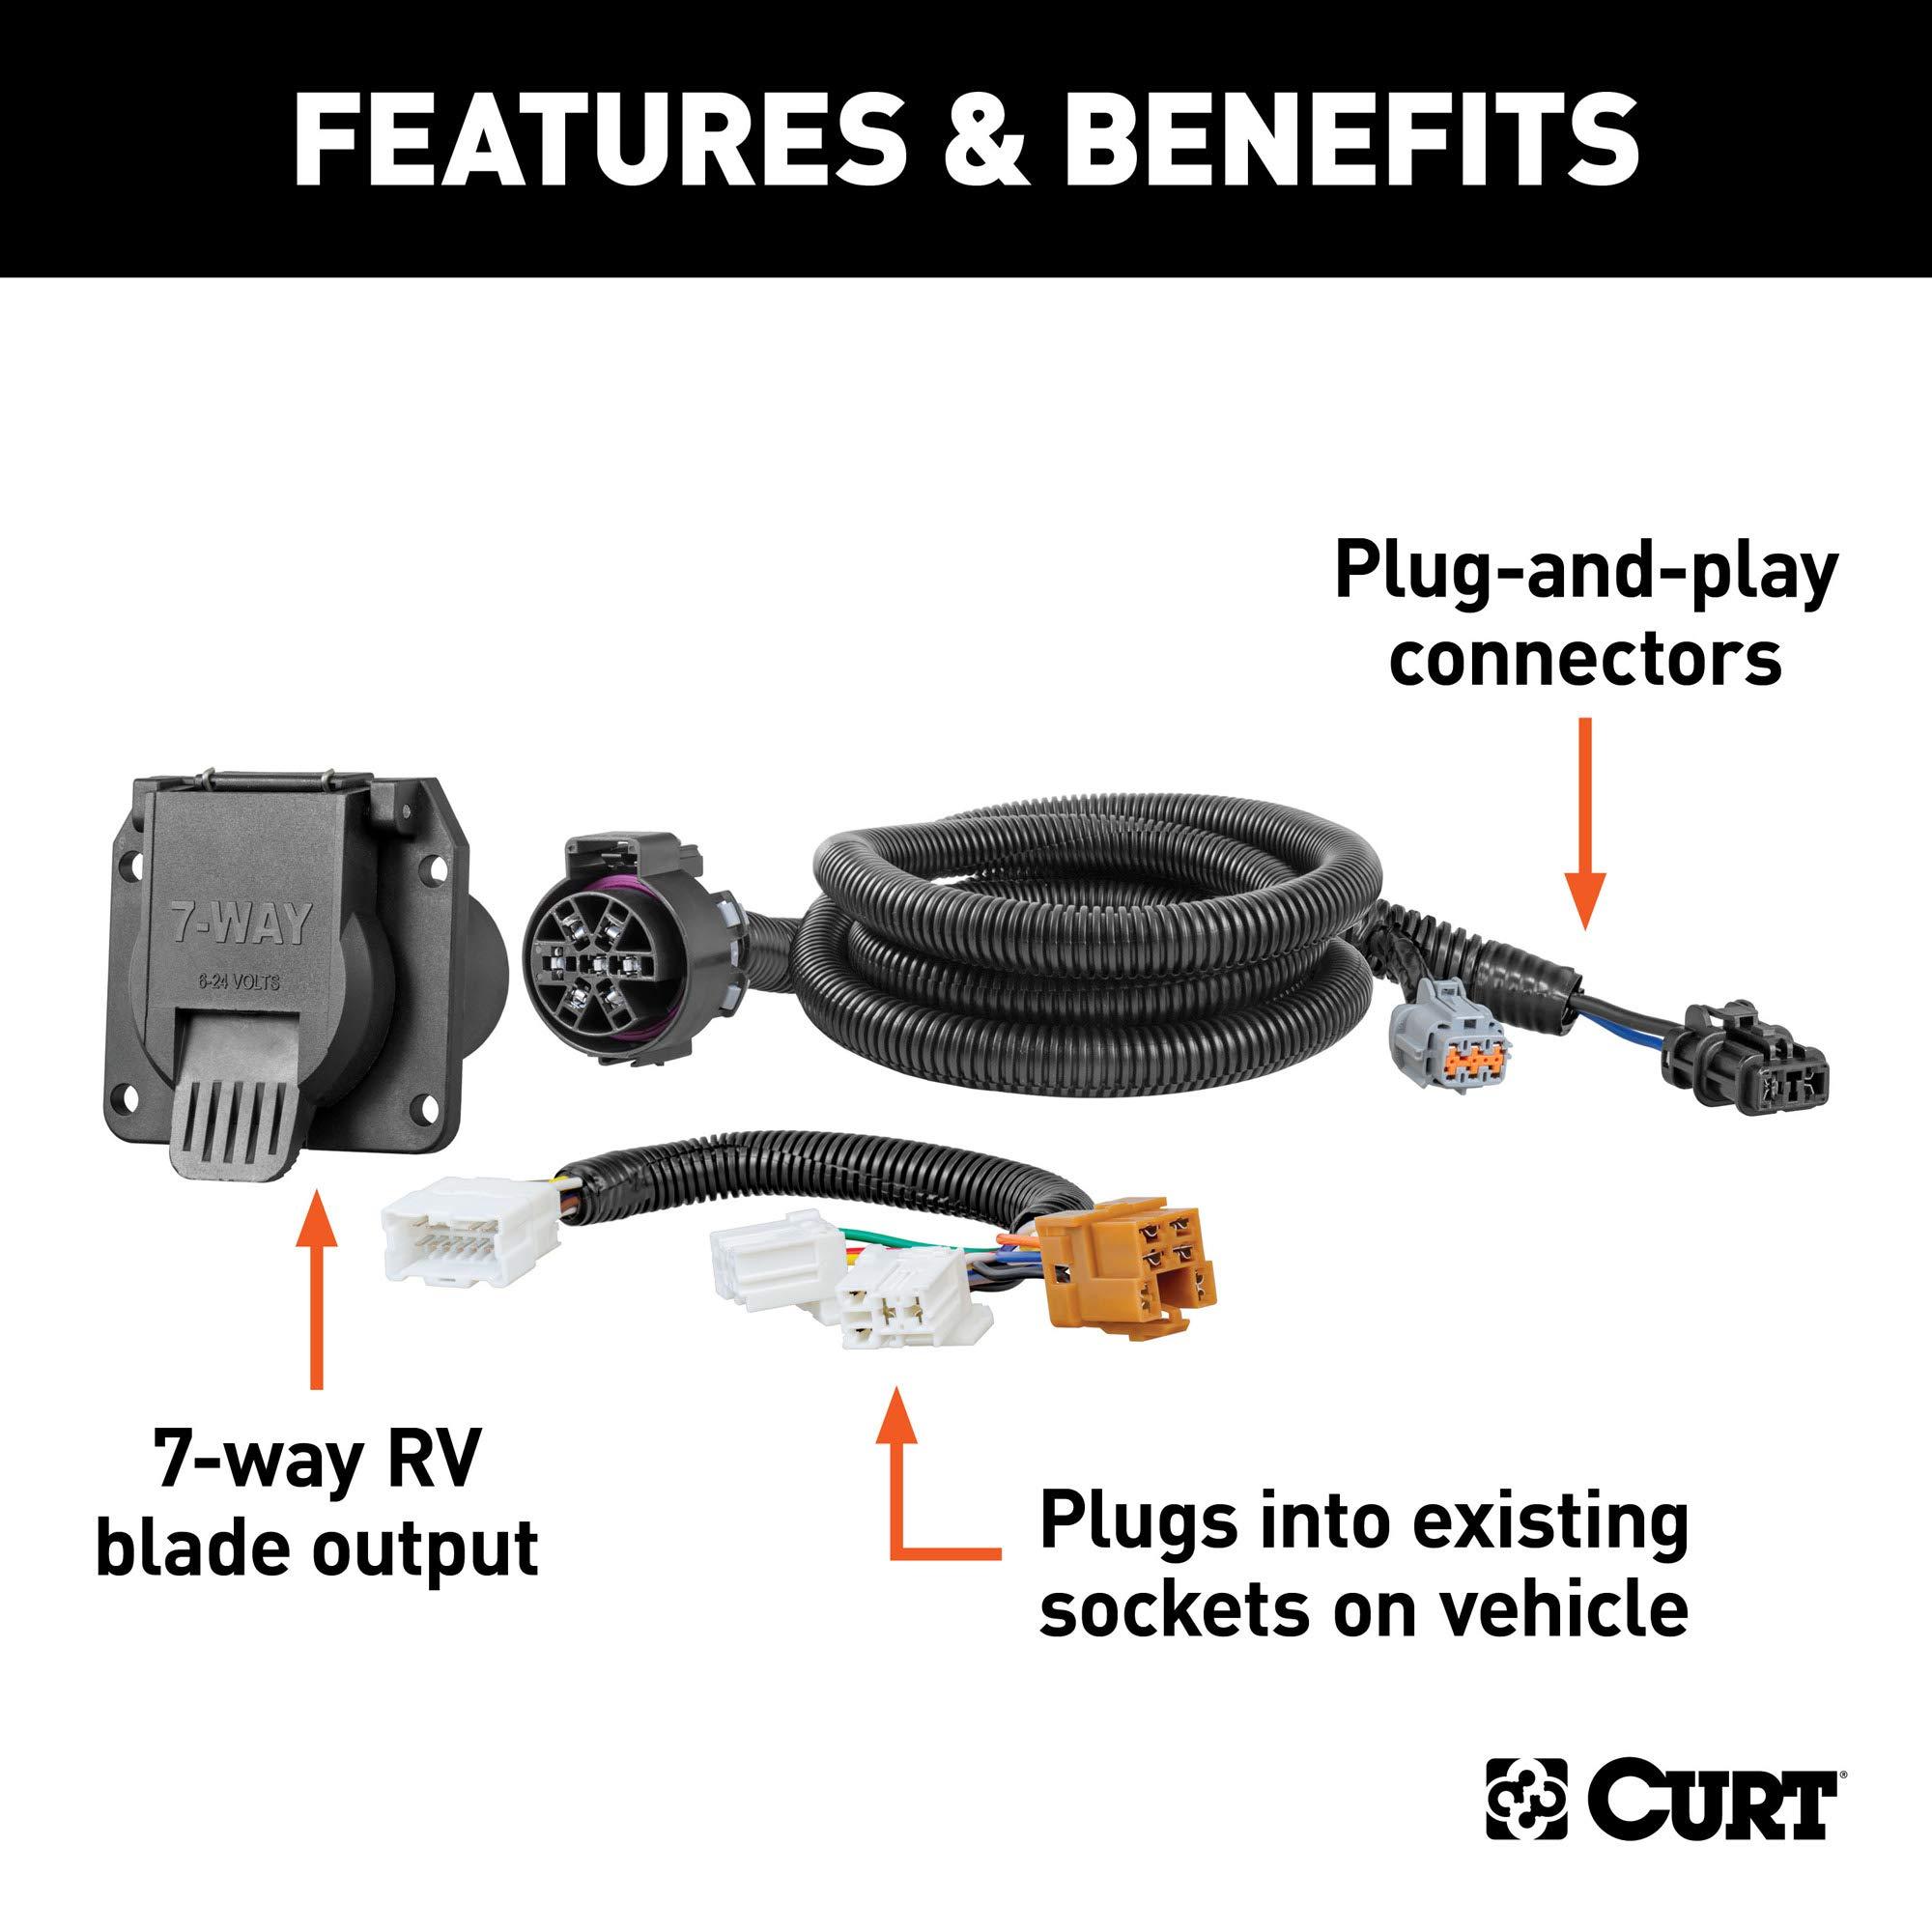 CURT 40 Vehicle Side Custom RV Blade 40 Pin Trailer Wiring Harness,  Select Nissan Frontier, Pathfinder, Xterra, Suzuki Equator